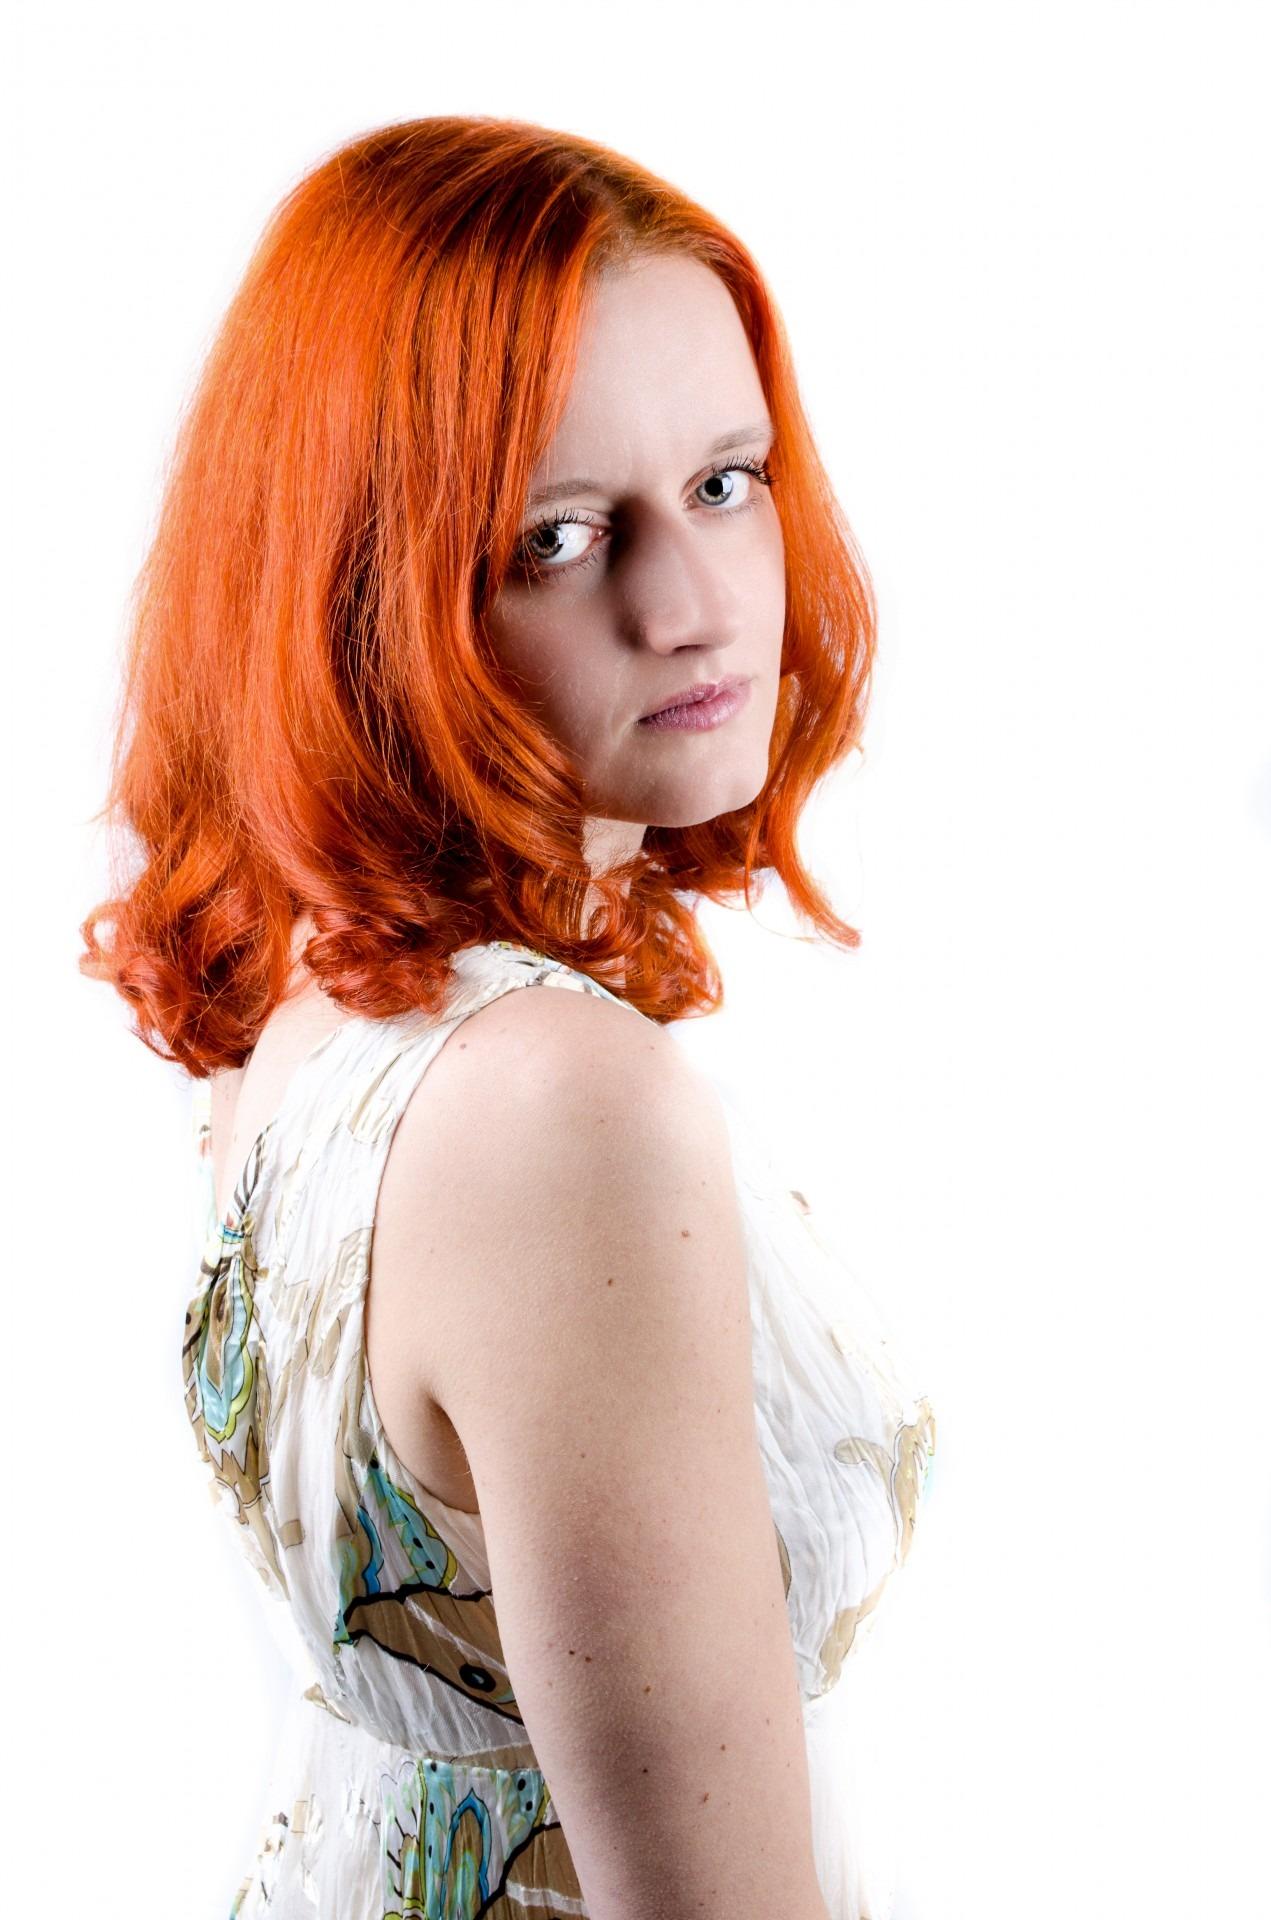 Free Fotobanka Osoba Lide Divka Zena Izolovany Portret Model